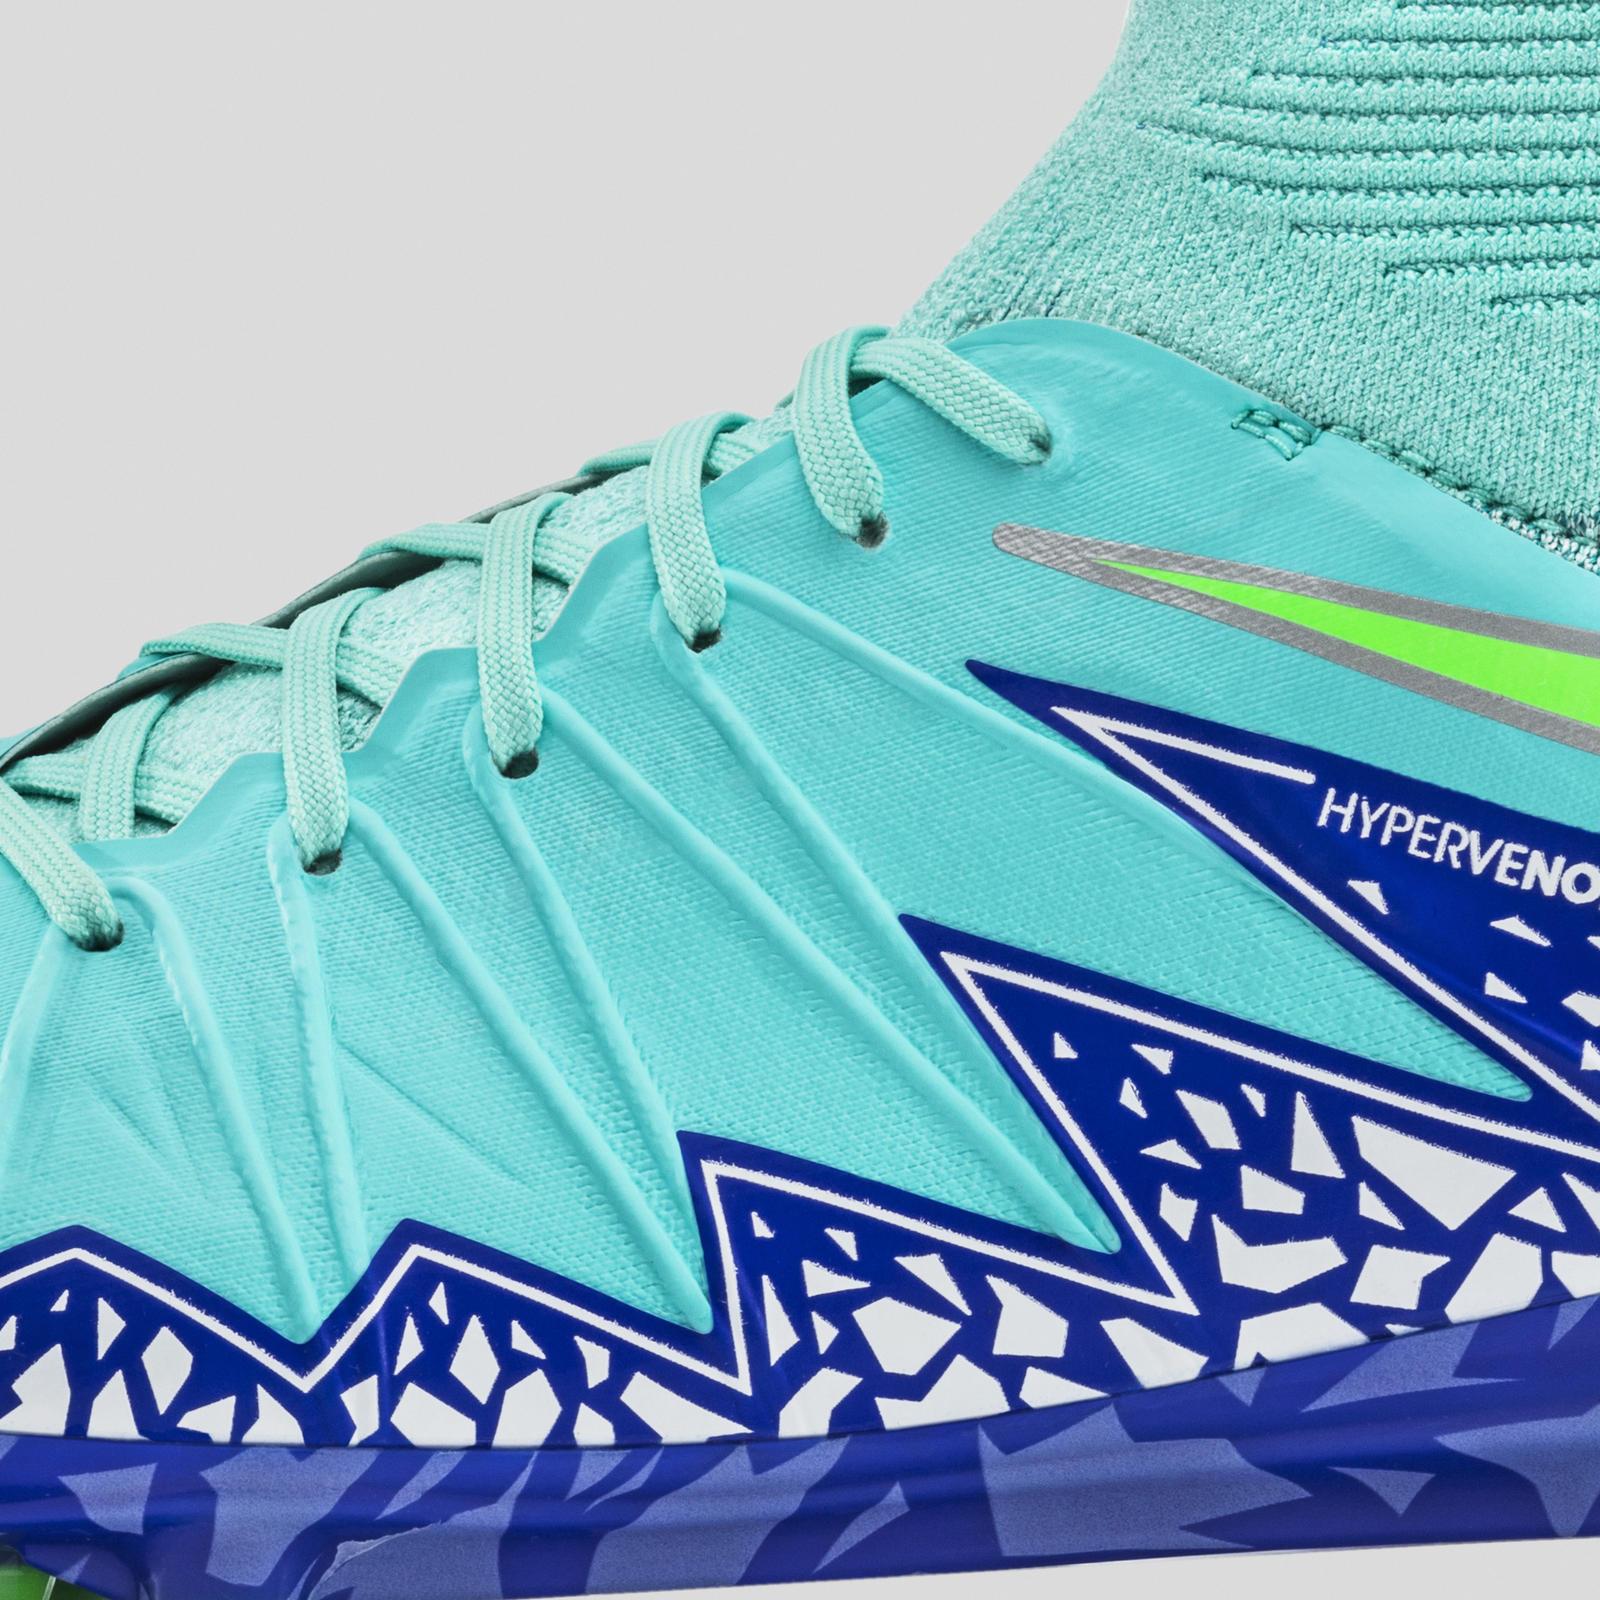 Nike Glbl Football Wmns Sp16 Hypvnm Phnsh Detail Lat